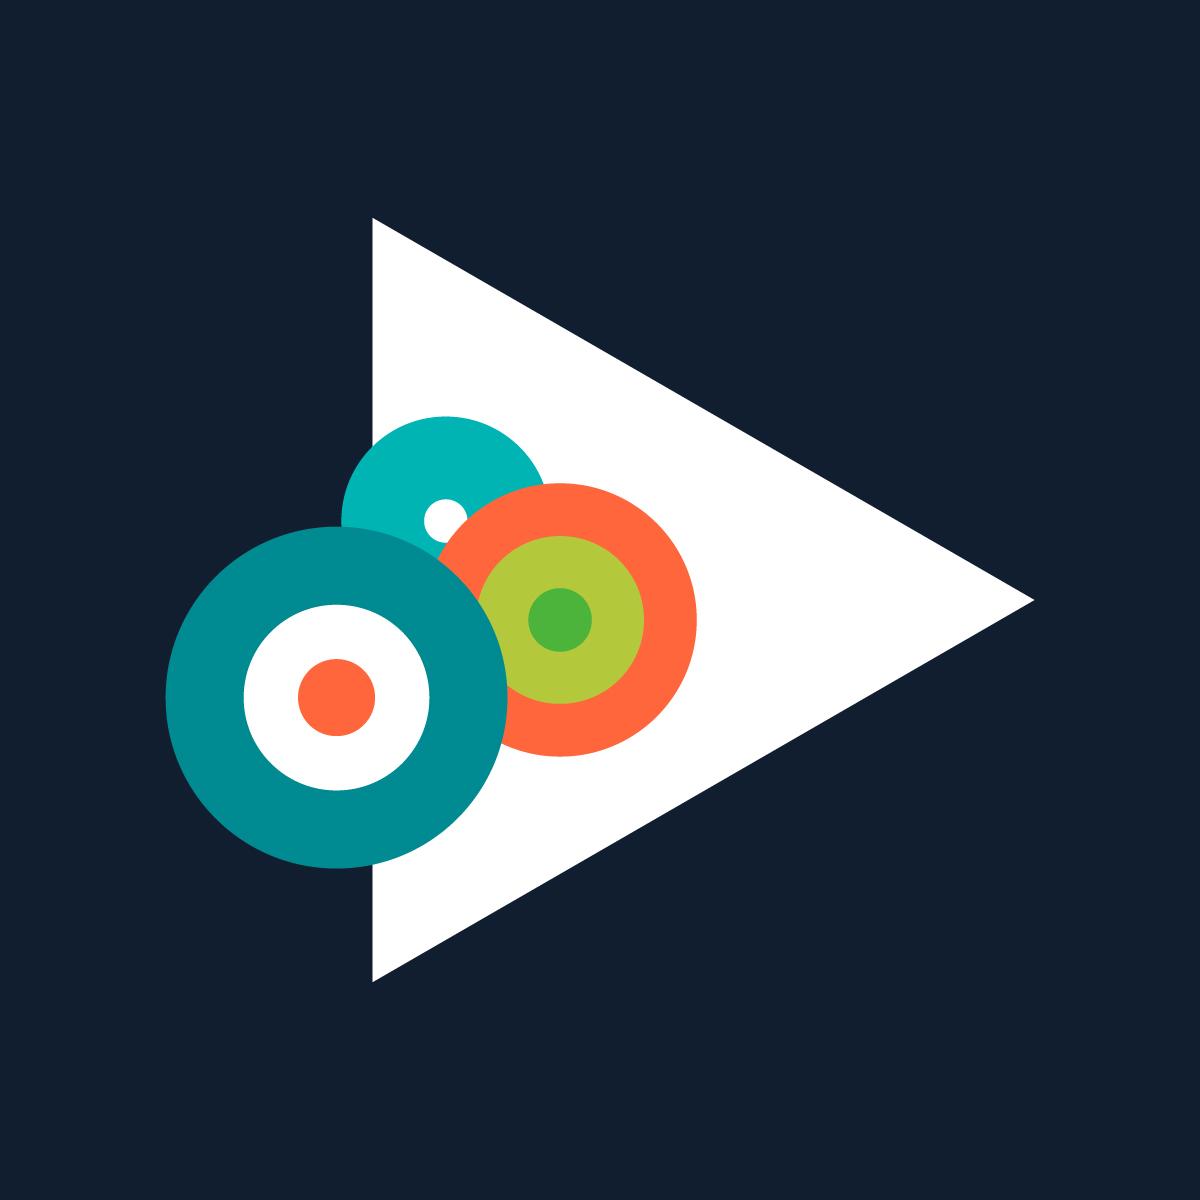 Starfish_2019_Icon_MovingImage.jpg